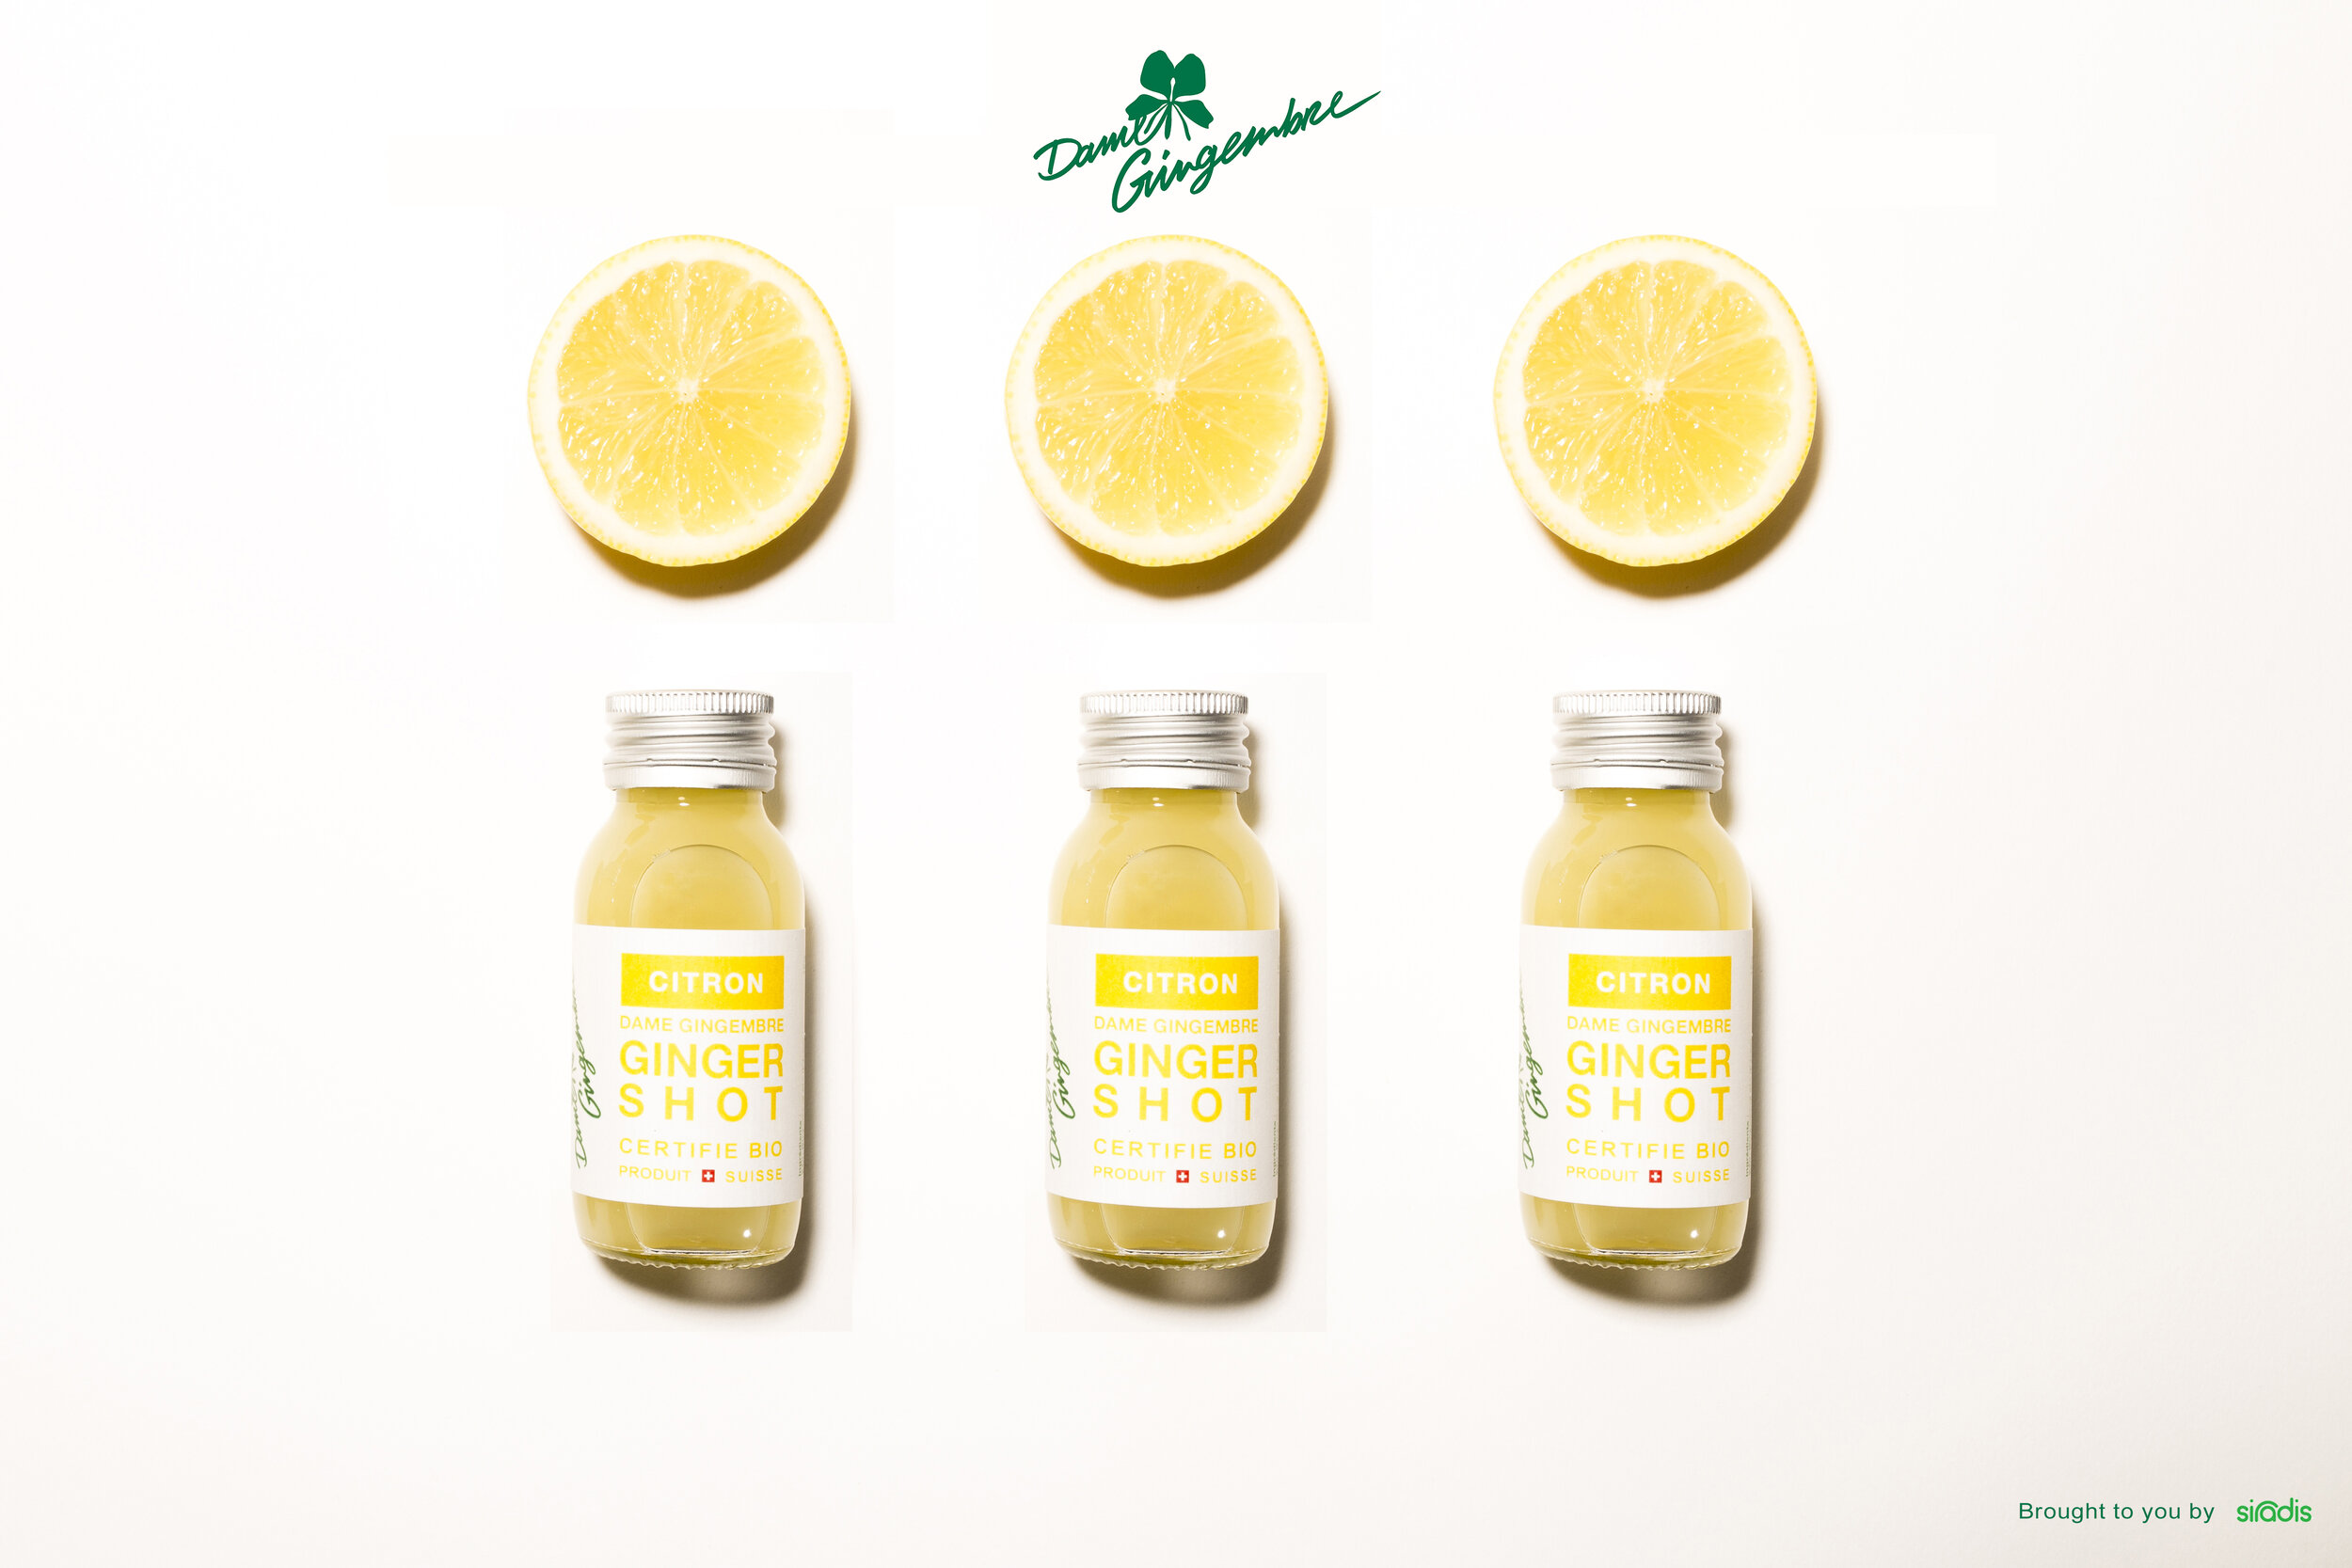 Shot gingembre citron dame gingembre